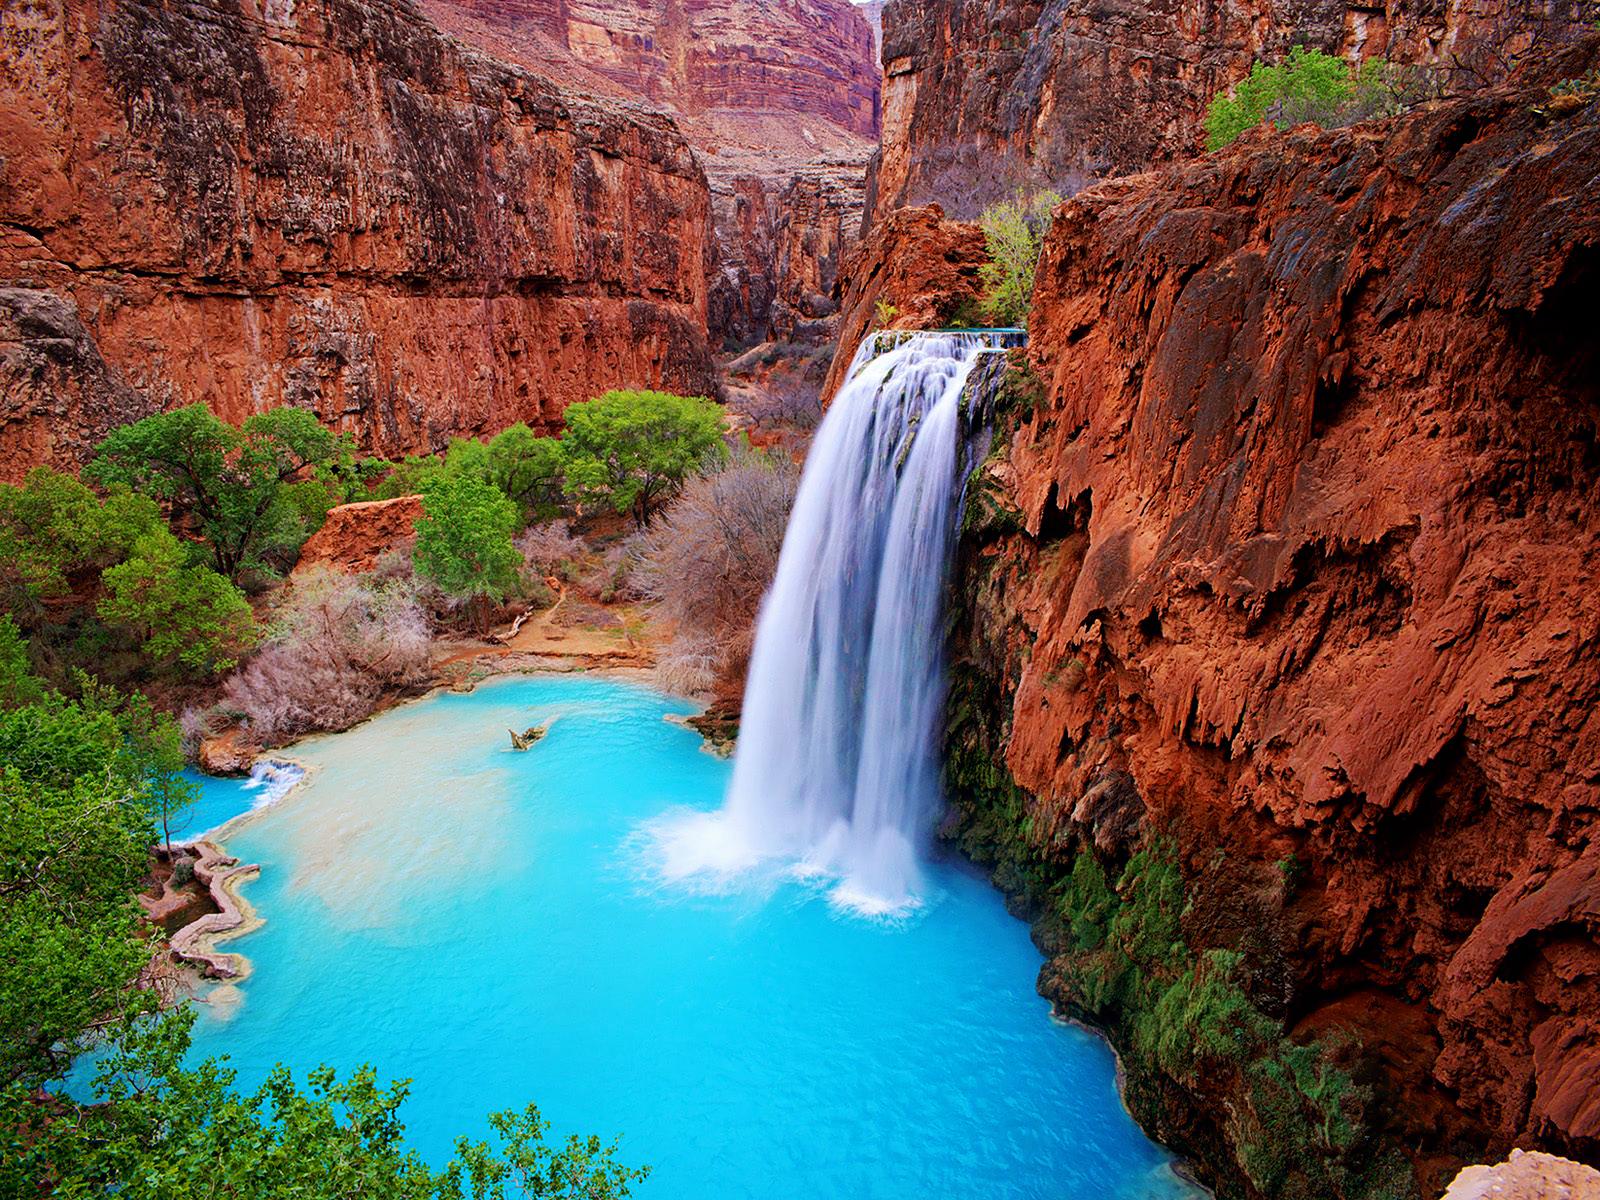 Desktop Waterfall Wallpaper Download Nature Beauty NextChanel 1600x1200